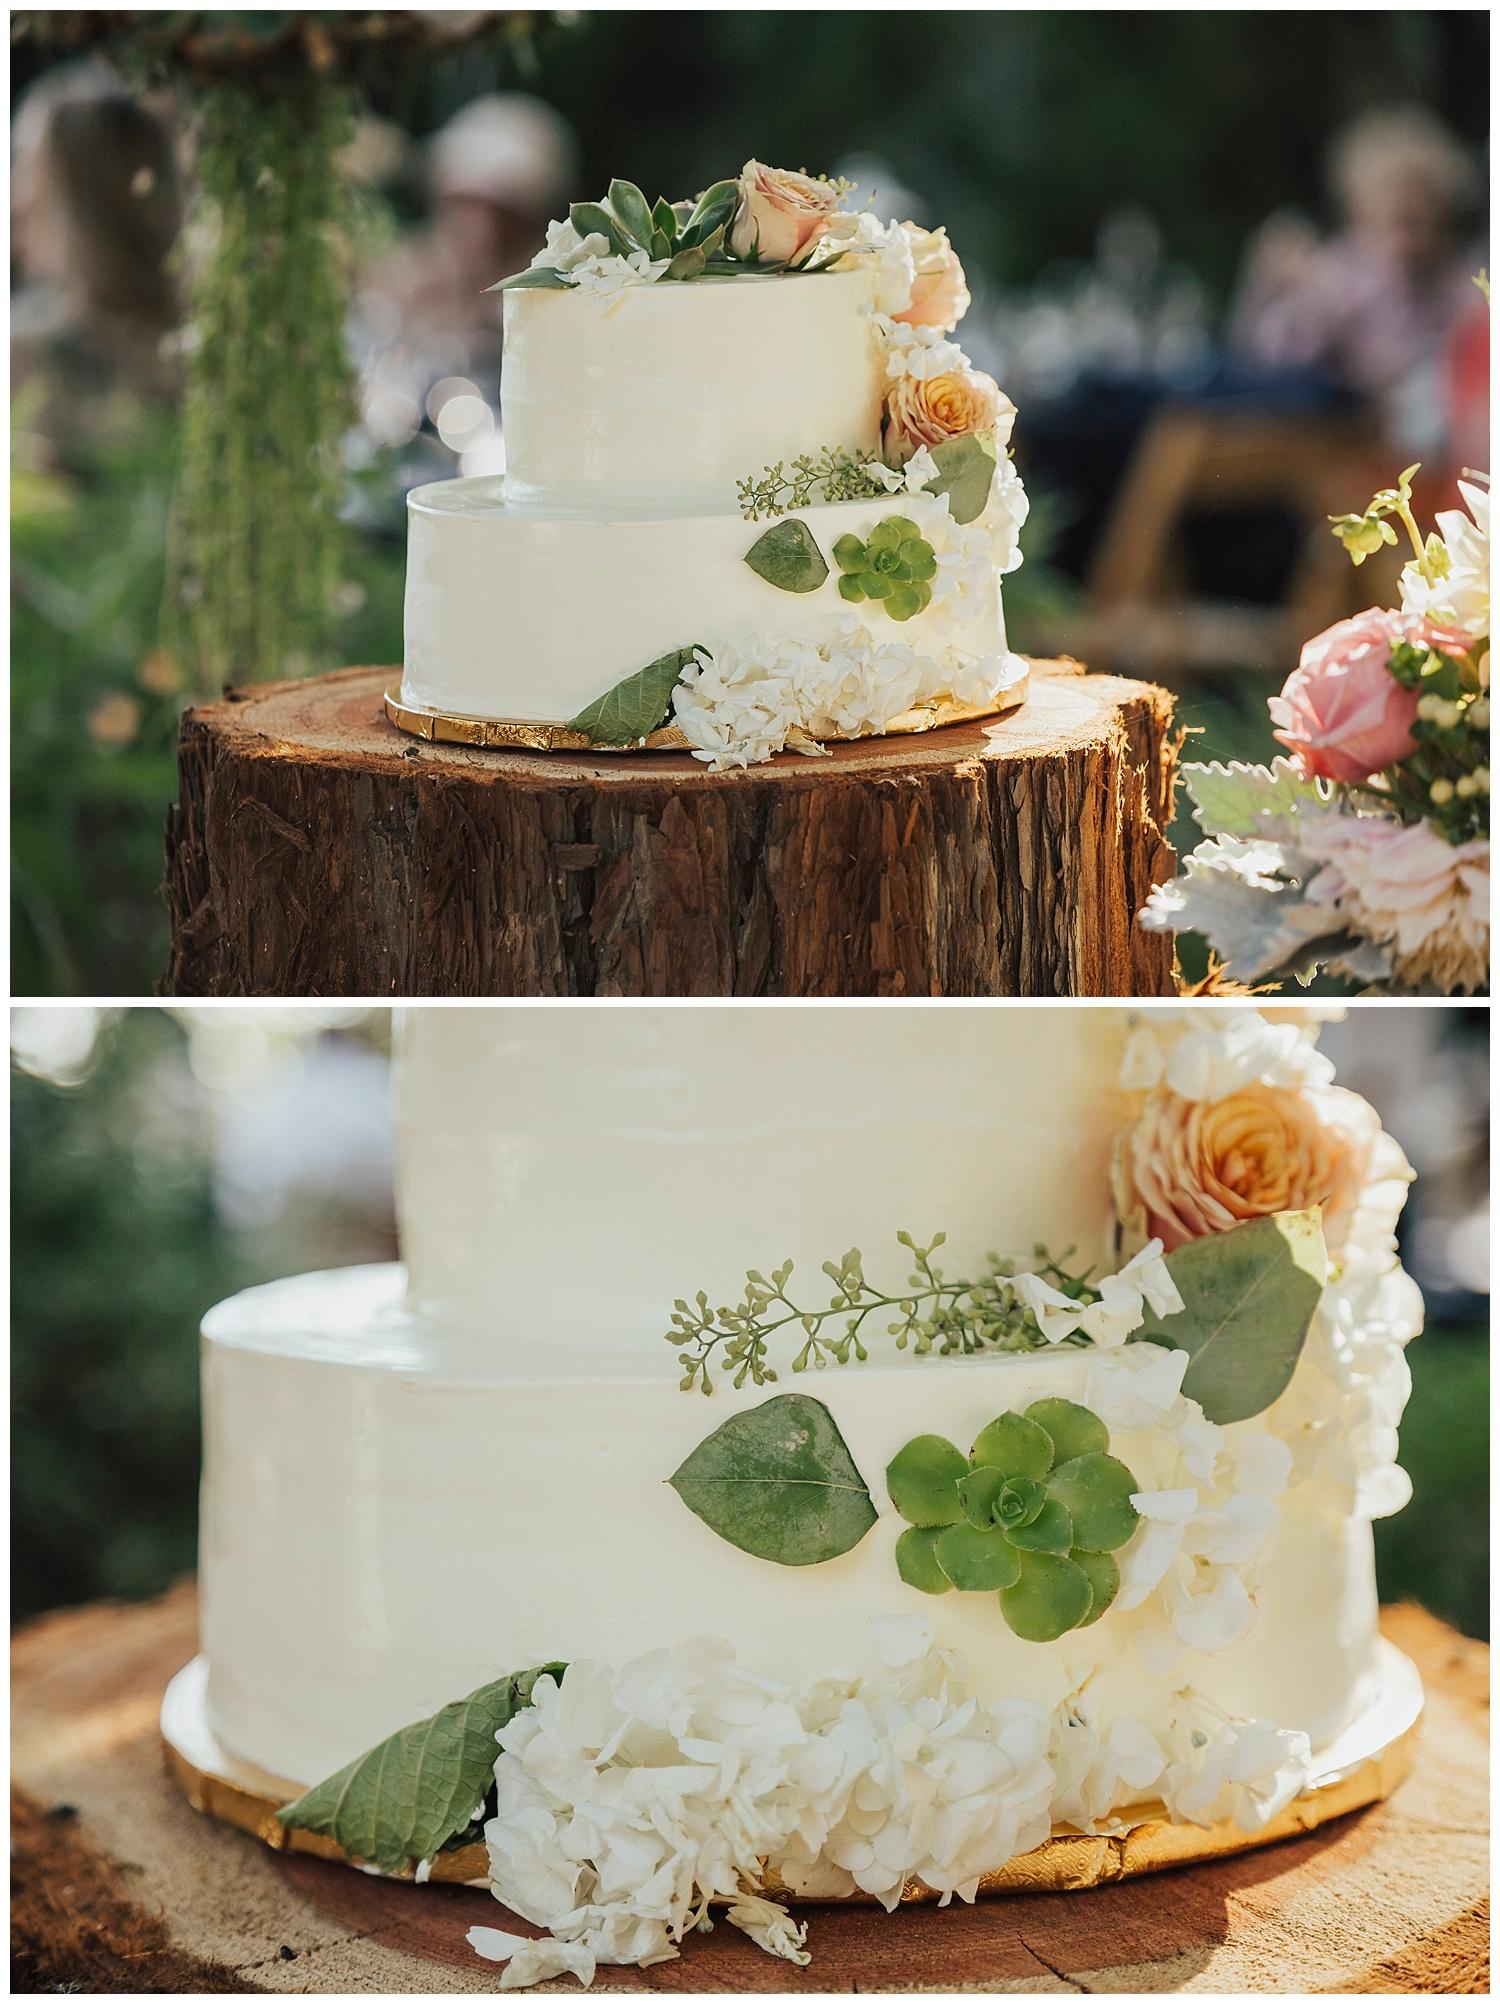 big-sur-summer-wedding-cake-table-carol-oliva-photography.jpg